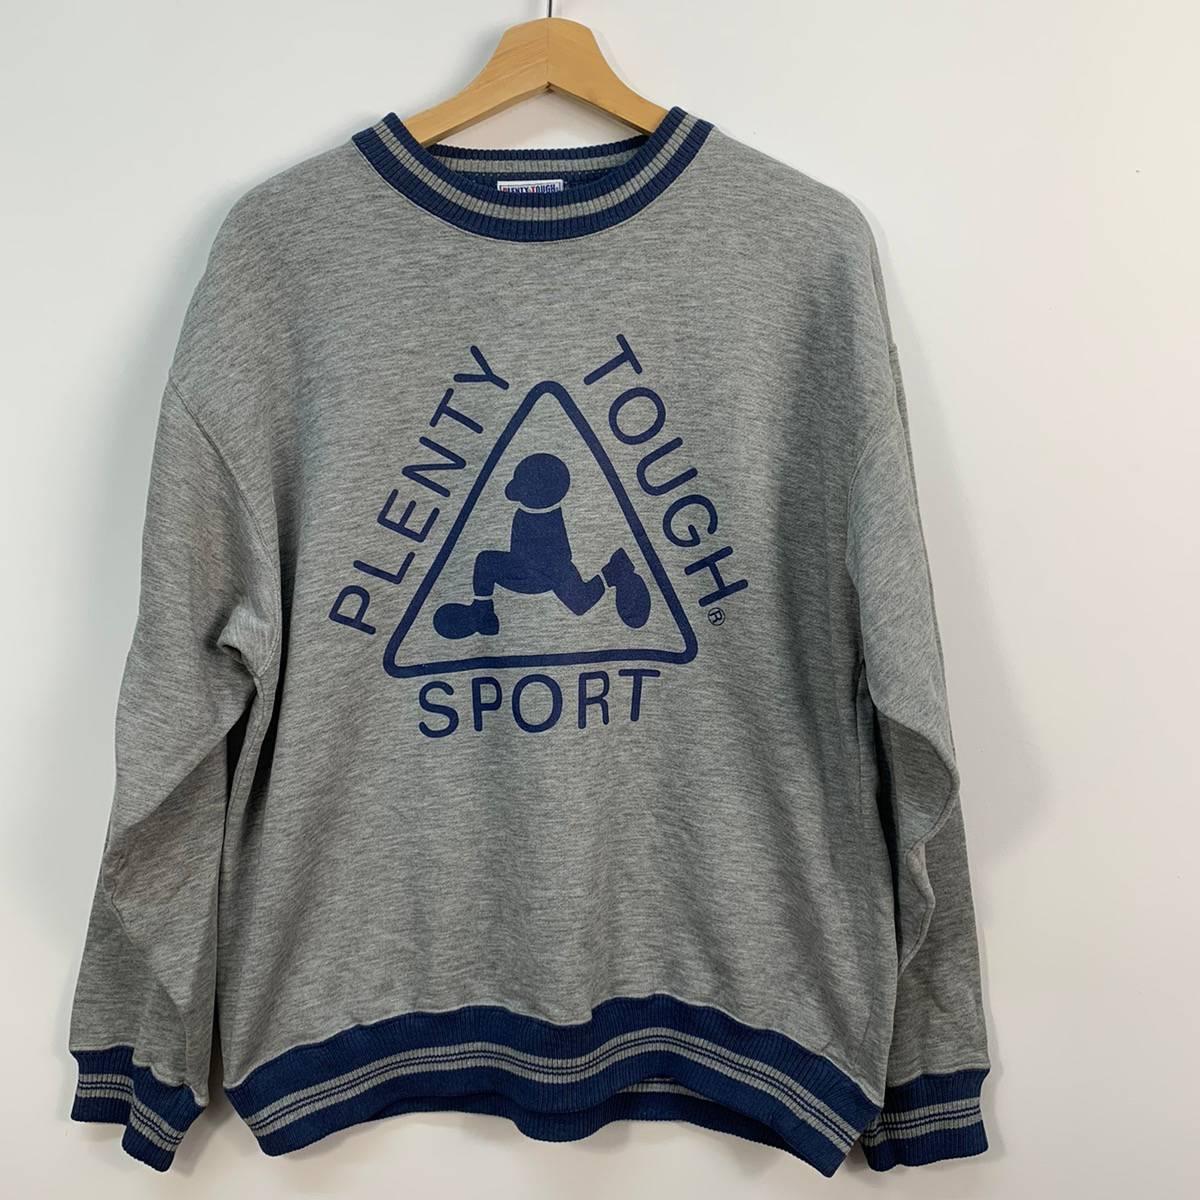 Sale! Vintage Plenty Touch Sport U.S.A Sweatshirt Size Small